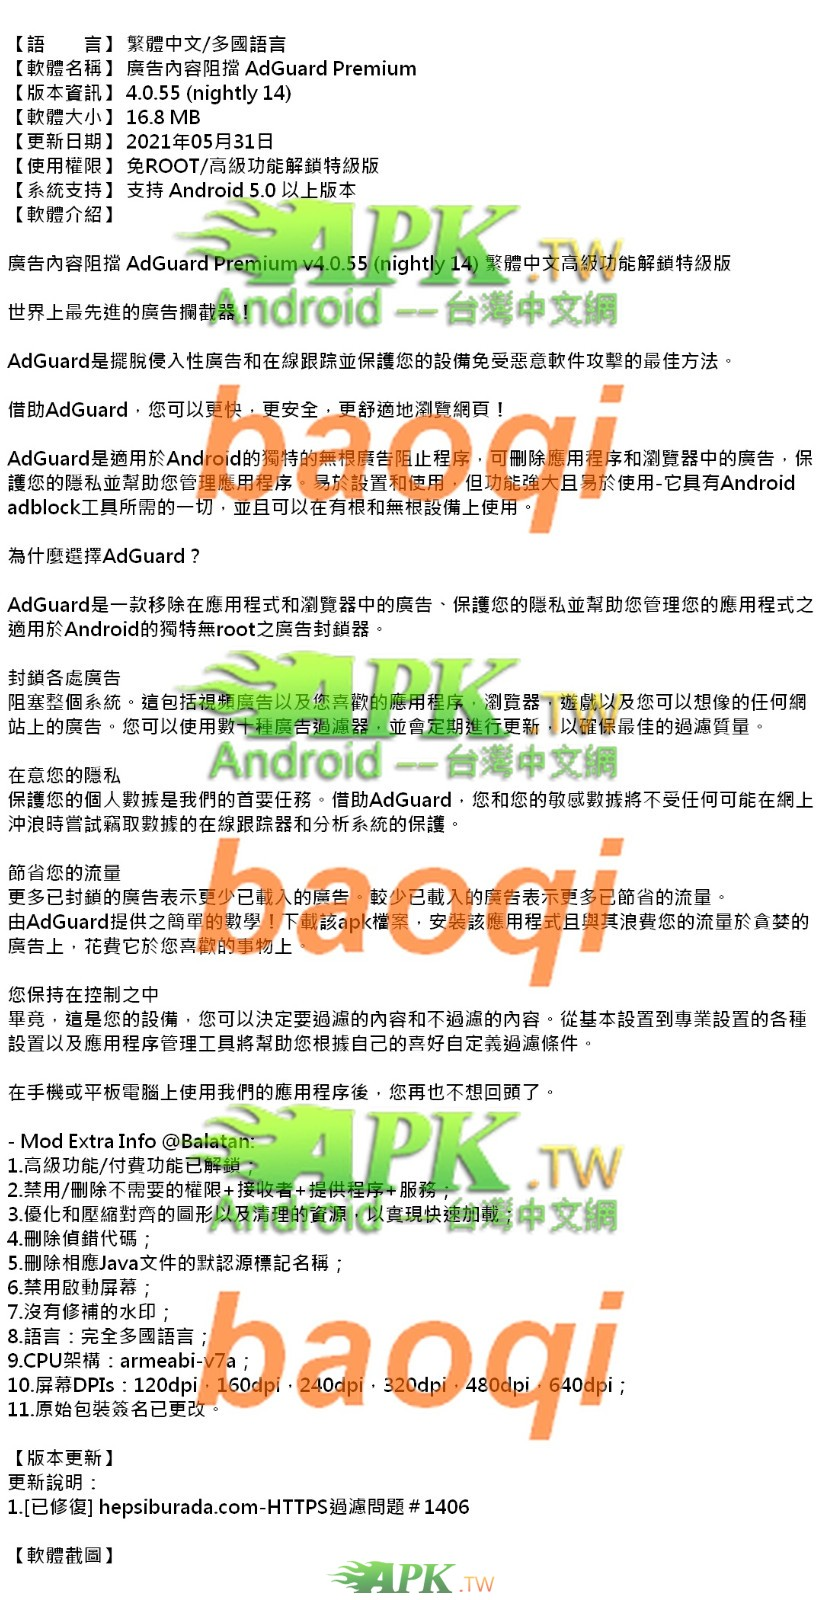 AdGuard_Premium_4.0.55_nightly14_.jpg